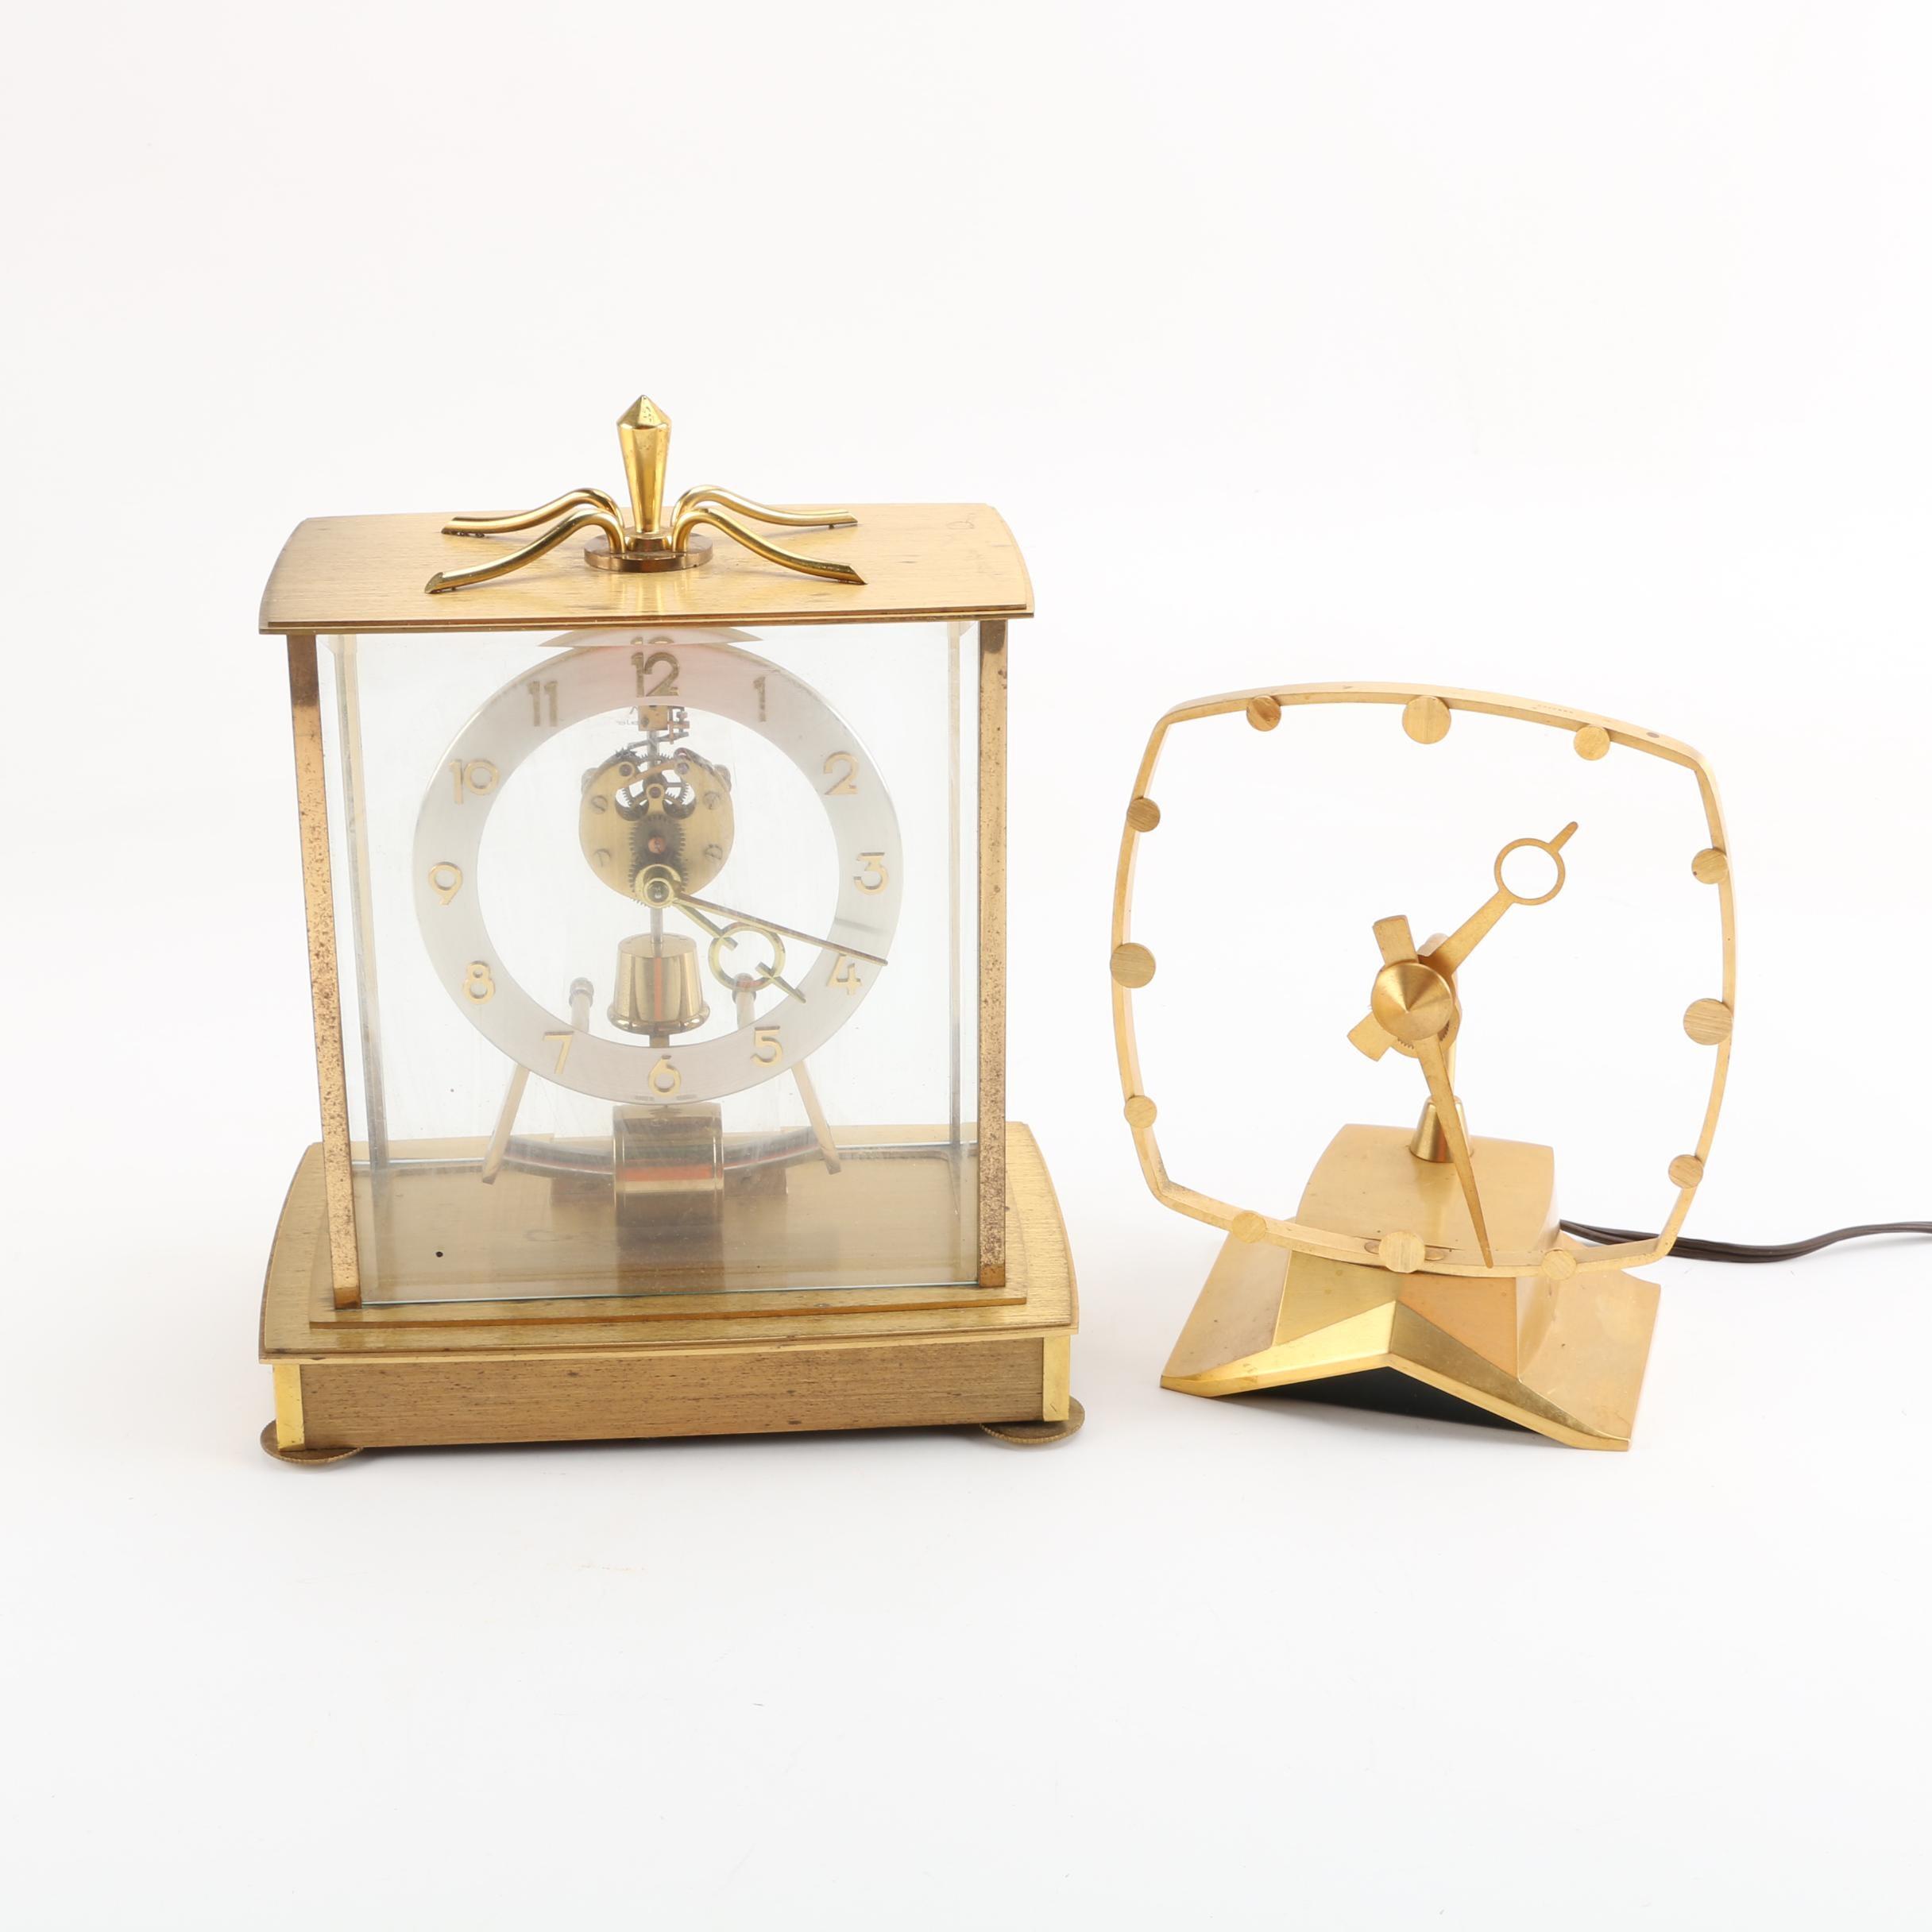 Contemporary Style Kundo and Jefferson Mantel Clocks